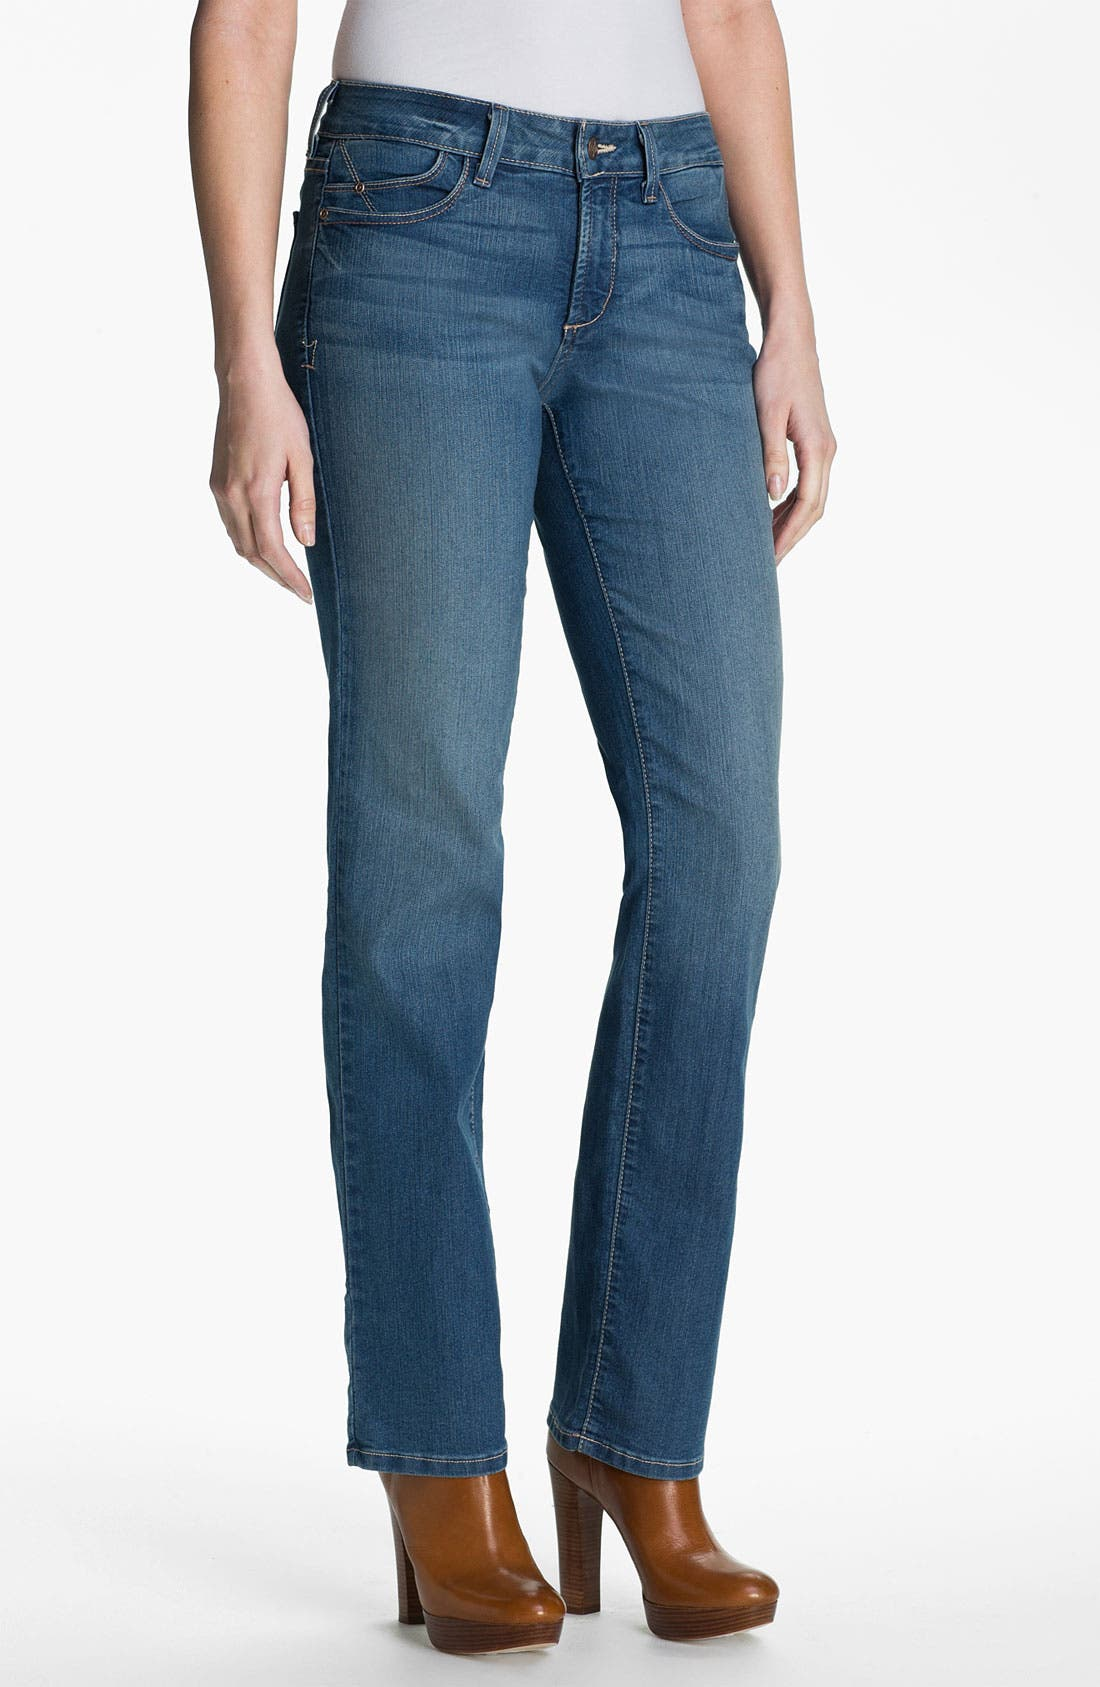 Main Image - NYDJ 'Marilyn' Stretch Straight Leg Jeans (Miami)